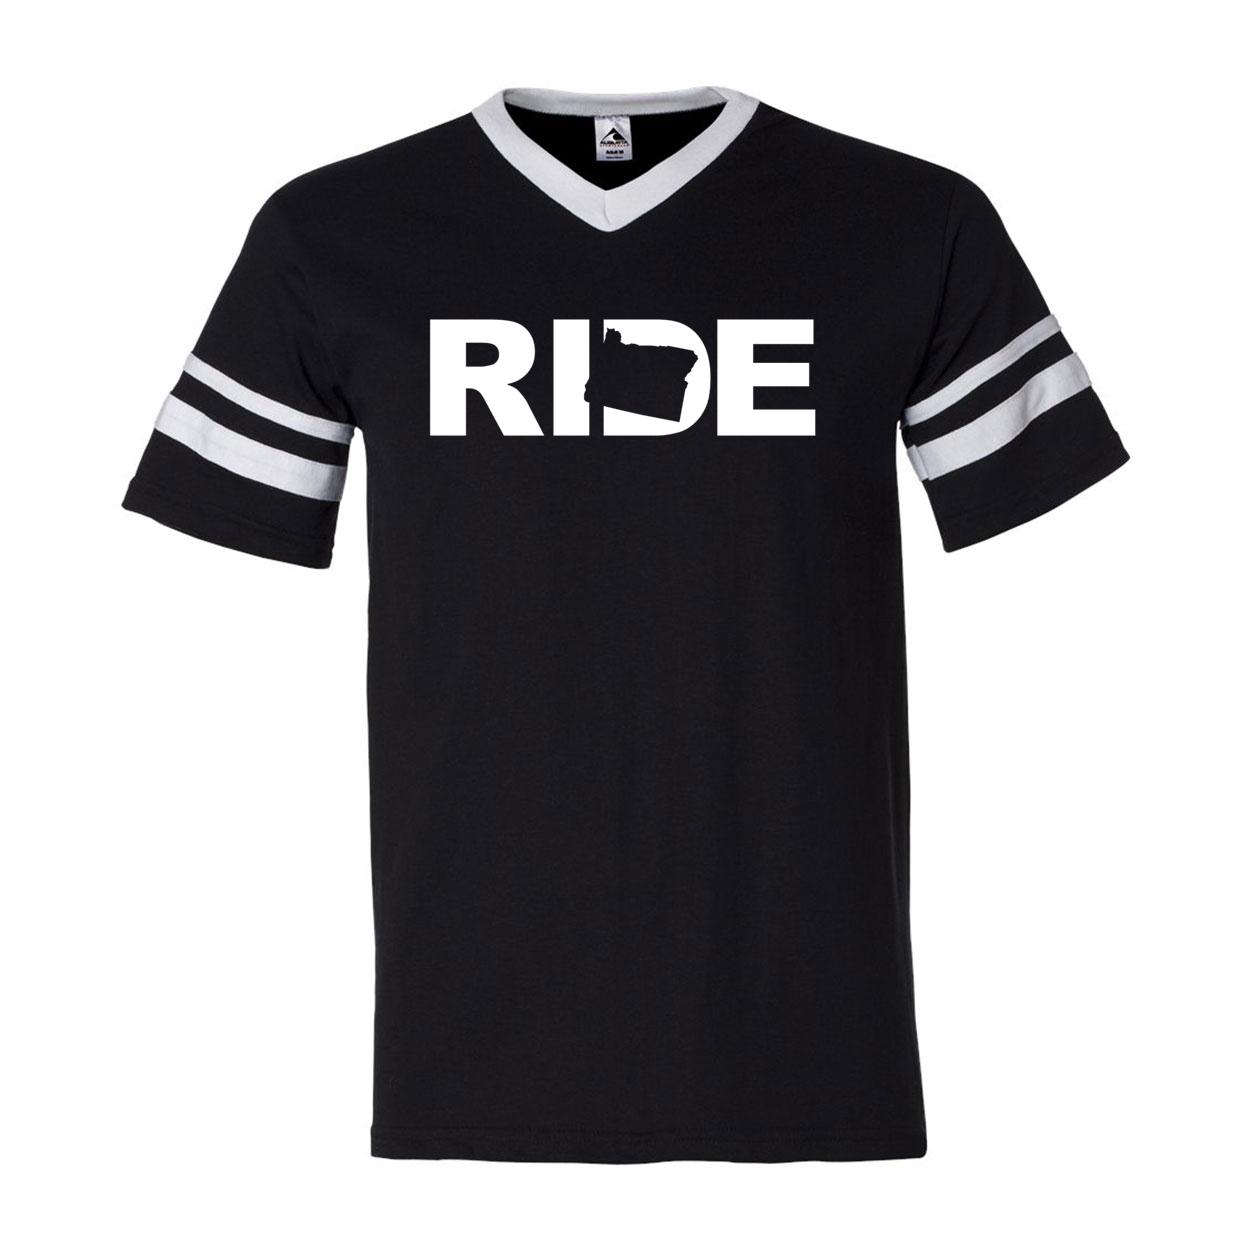 Ride Oregon Classic Premium Striped Jersey T-Shirt Black/White (White Logo)